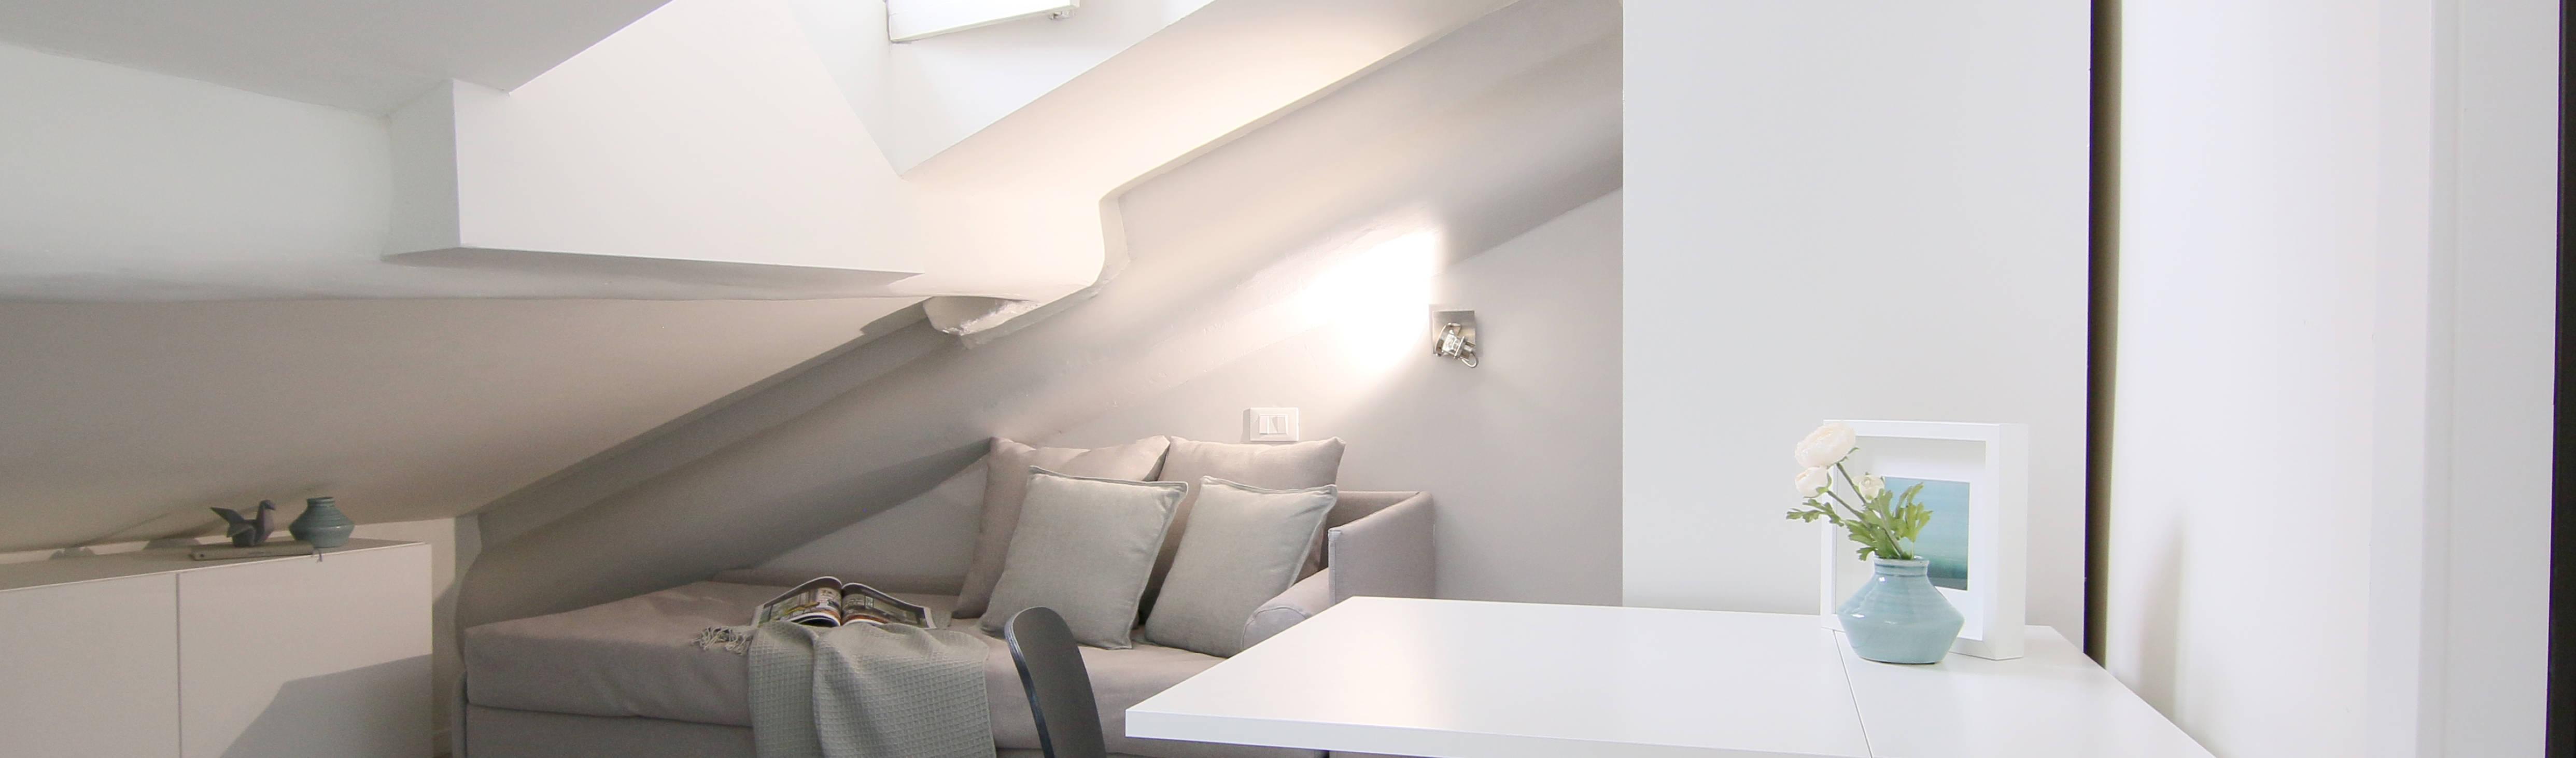 Arching—Architettura d'interni & home staging